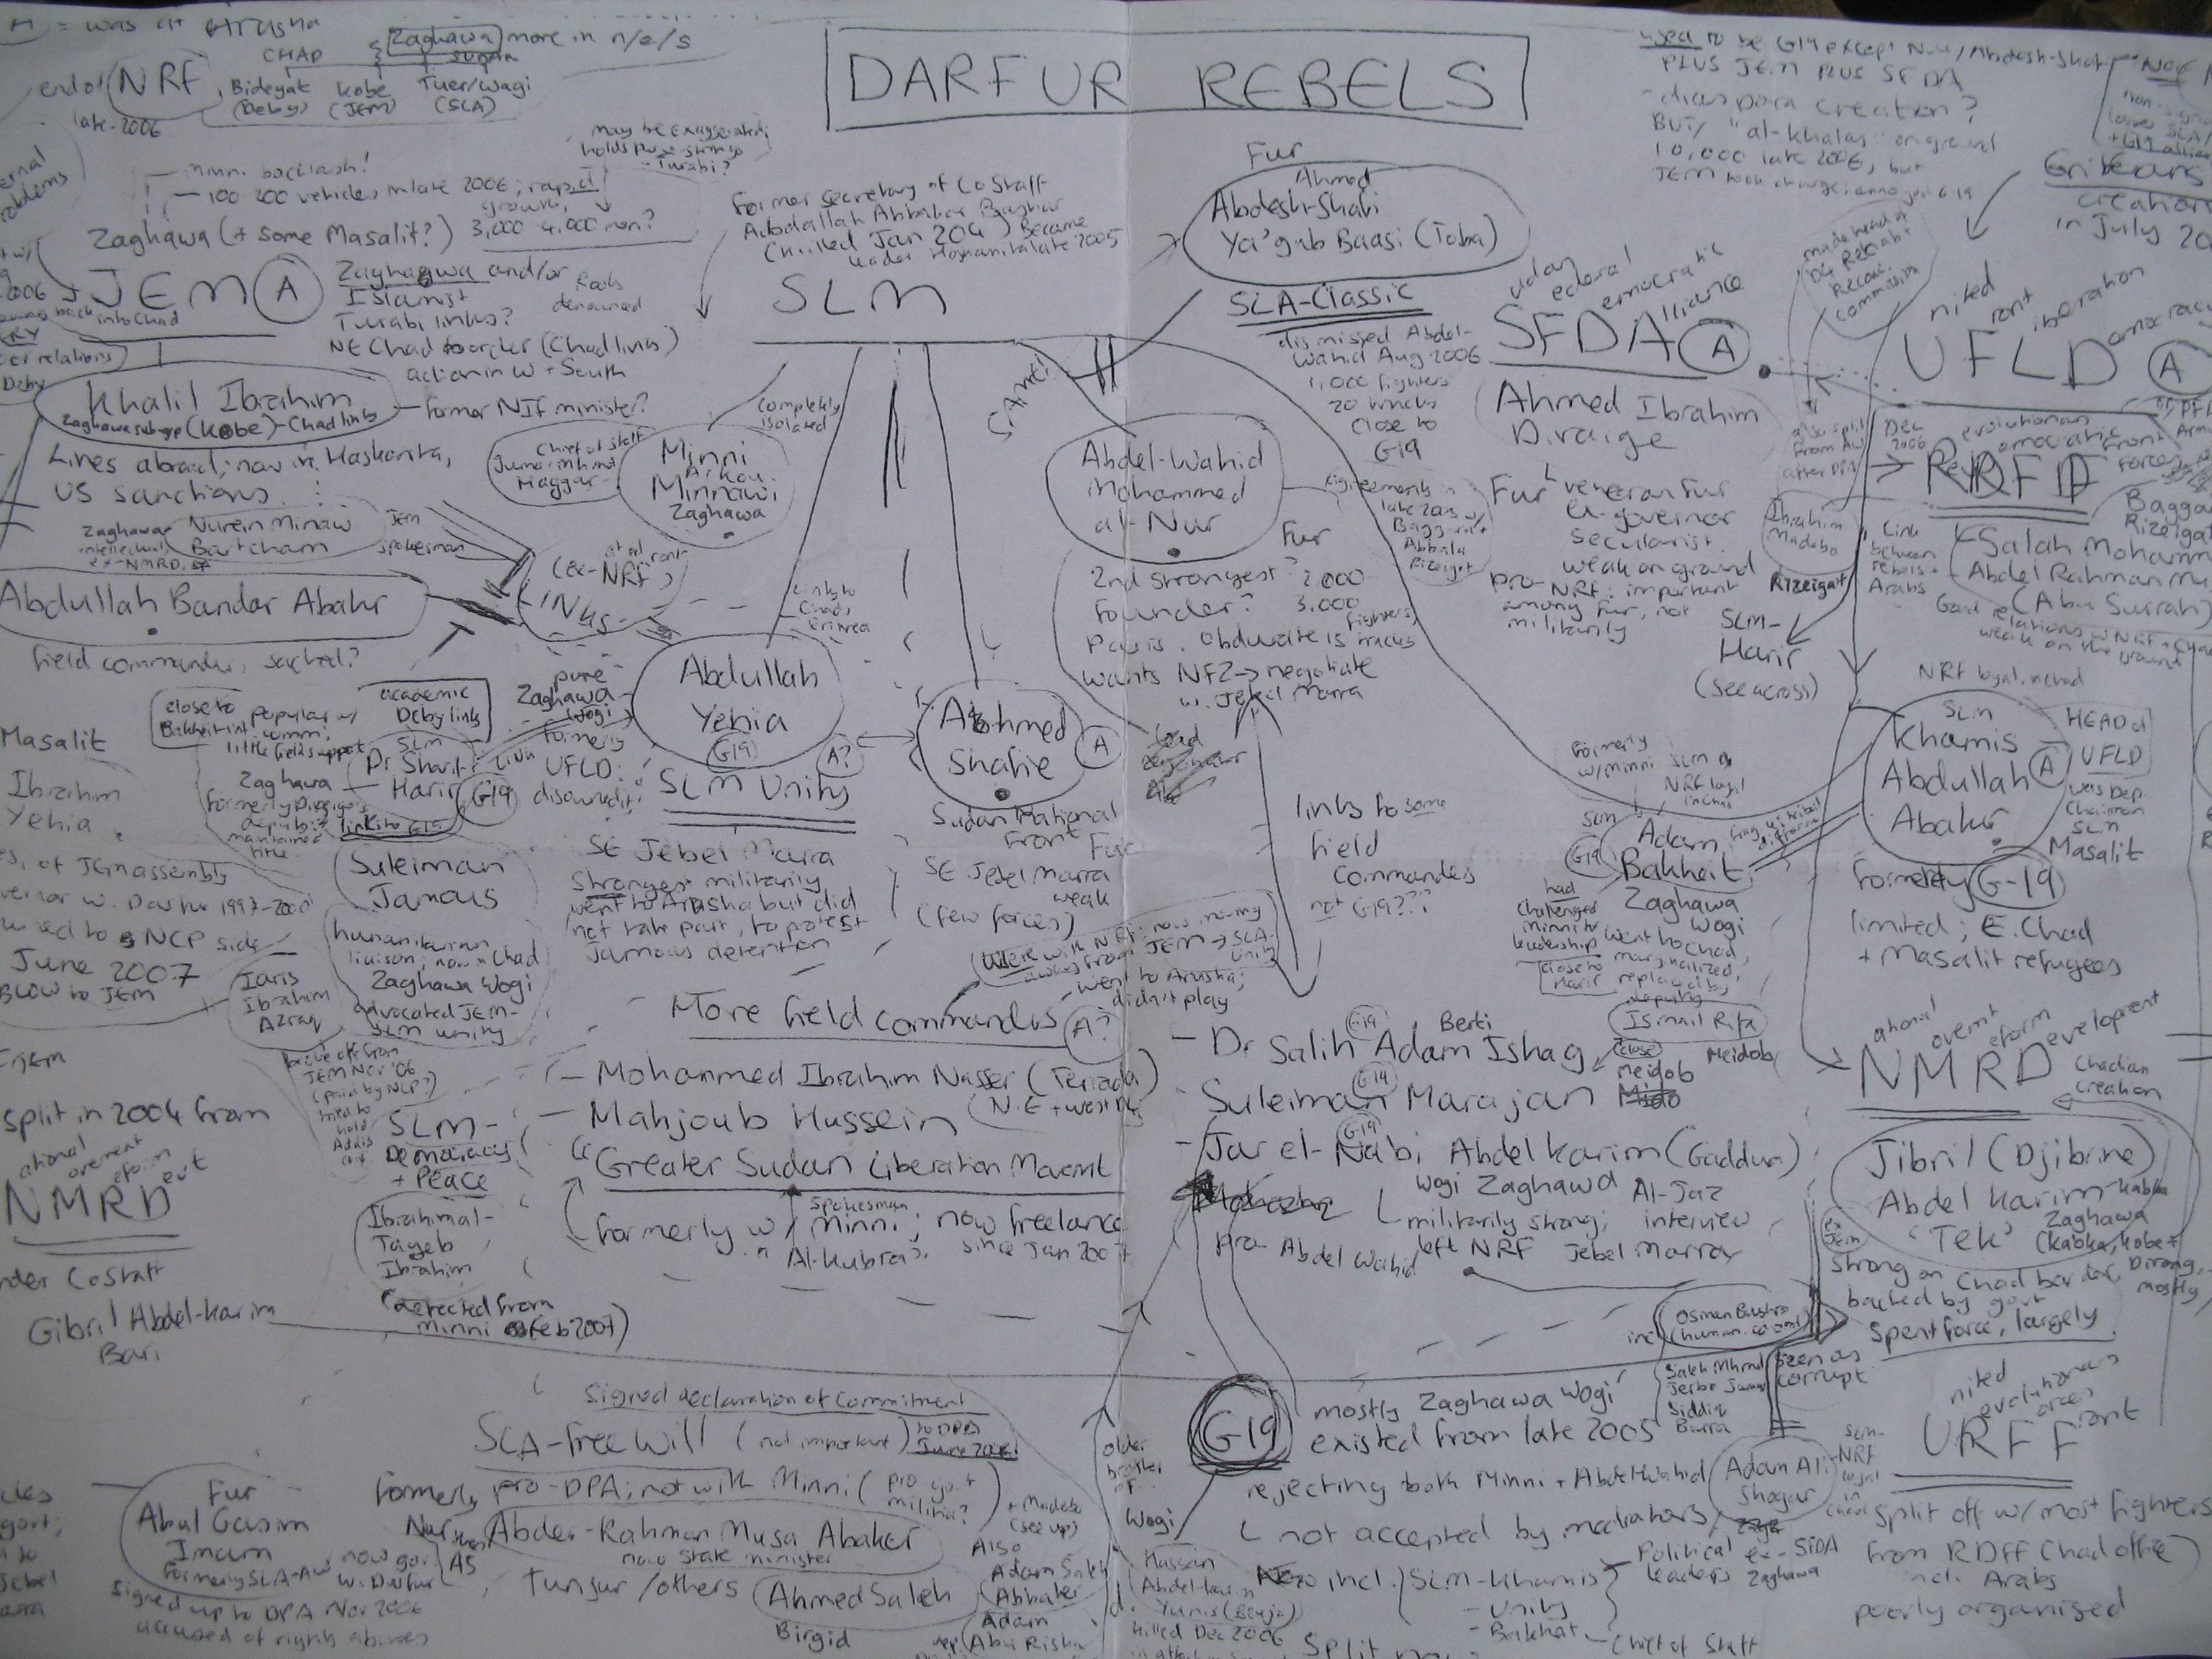 http://frontlineclub.com/blogs/robcrilly/rebelplan%20001.jpg